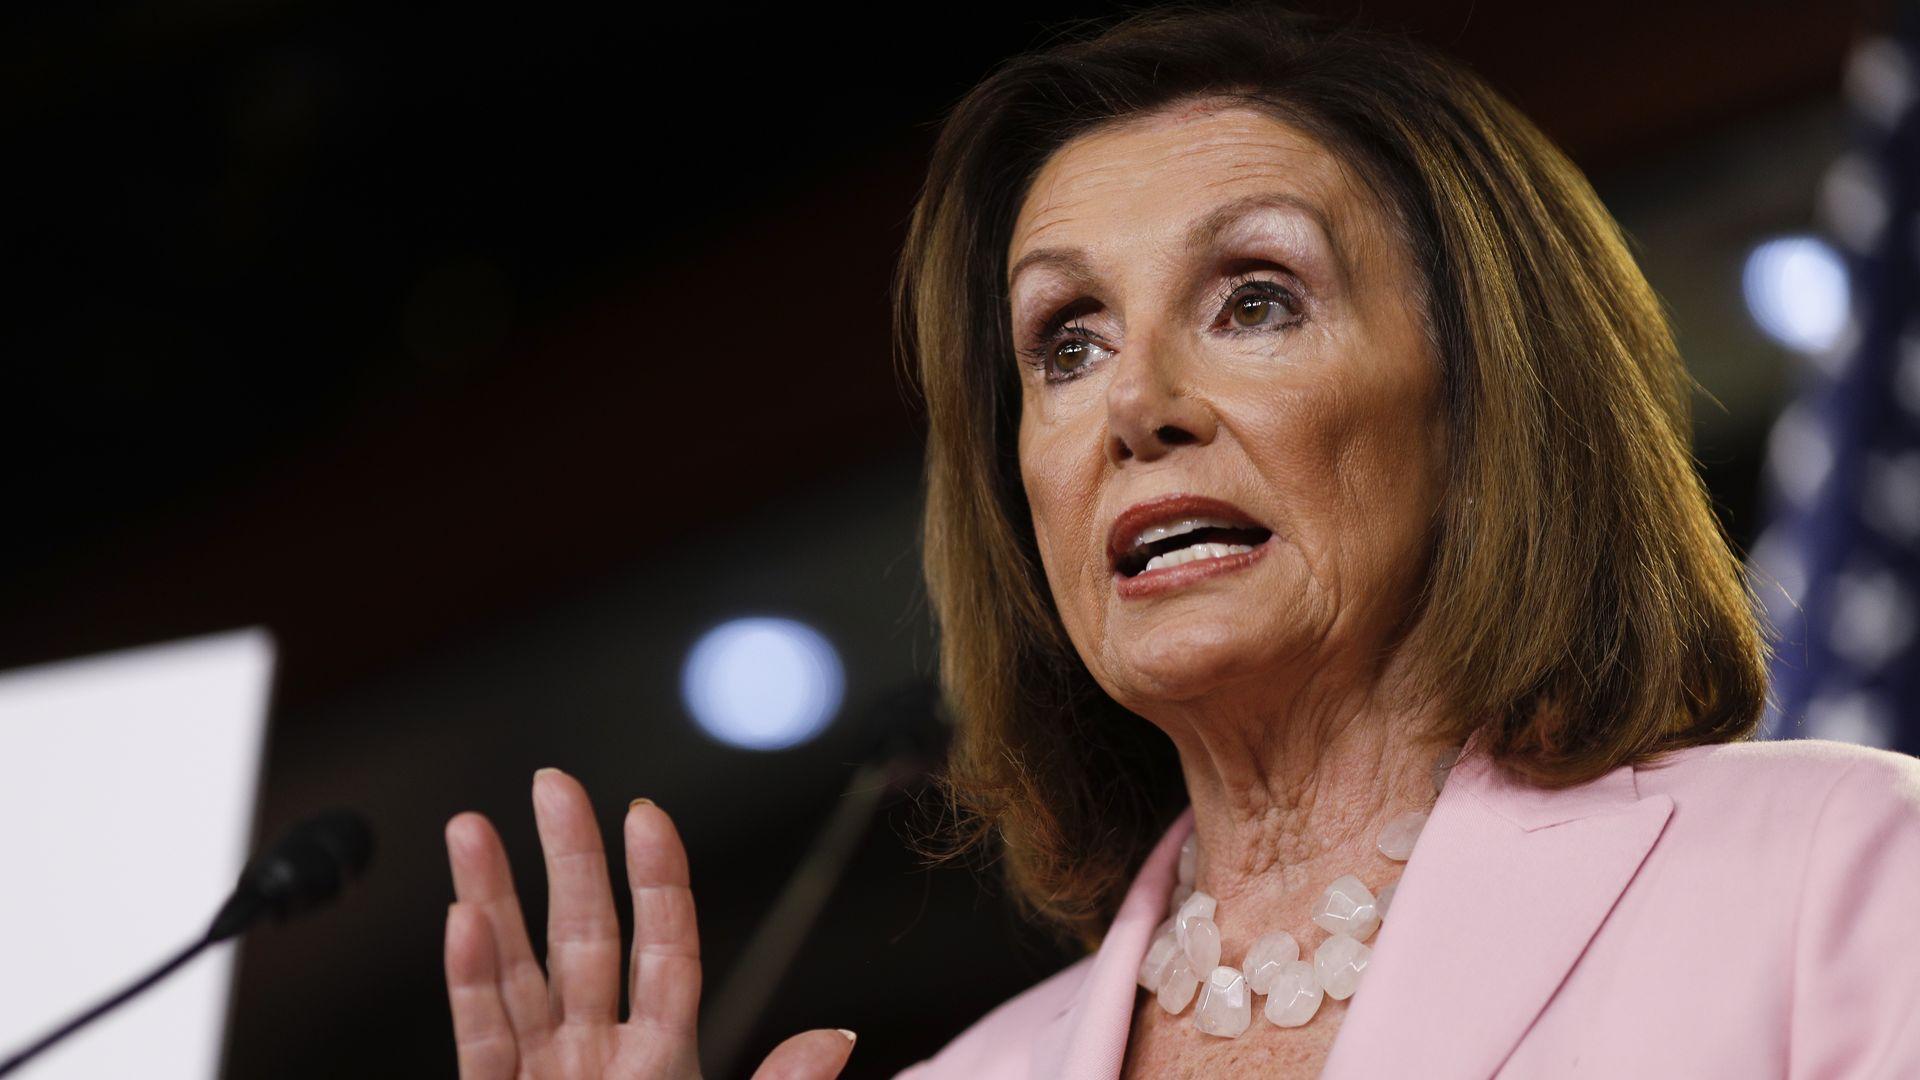 Nancy Pelosi hints at impeachment over Trump-Ukraine whistleblower ...